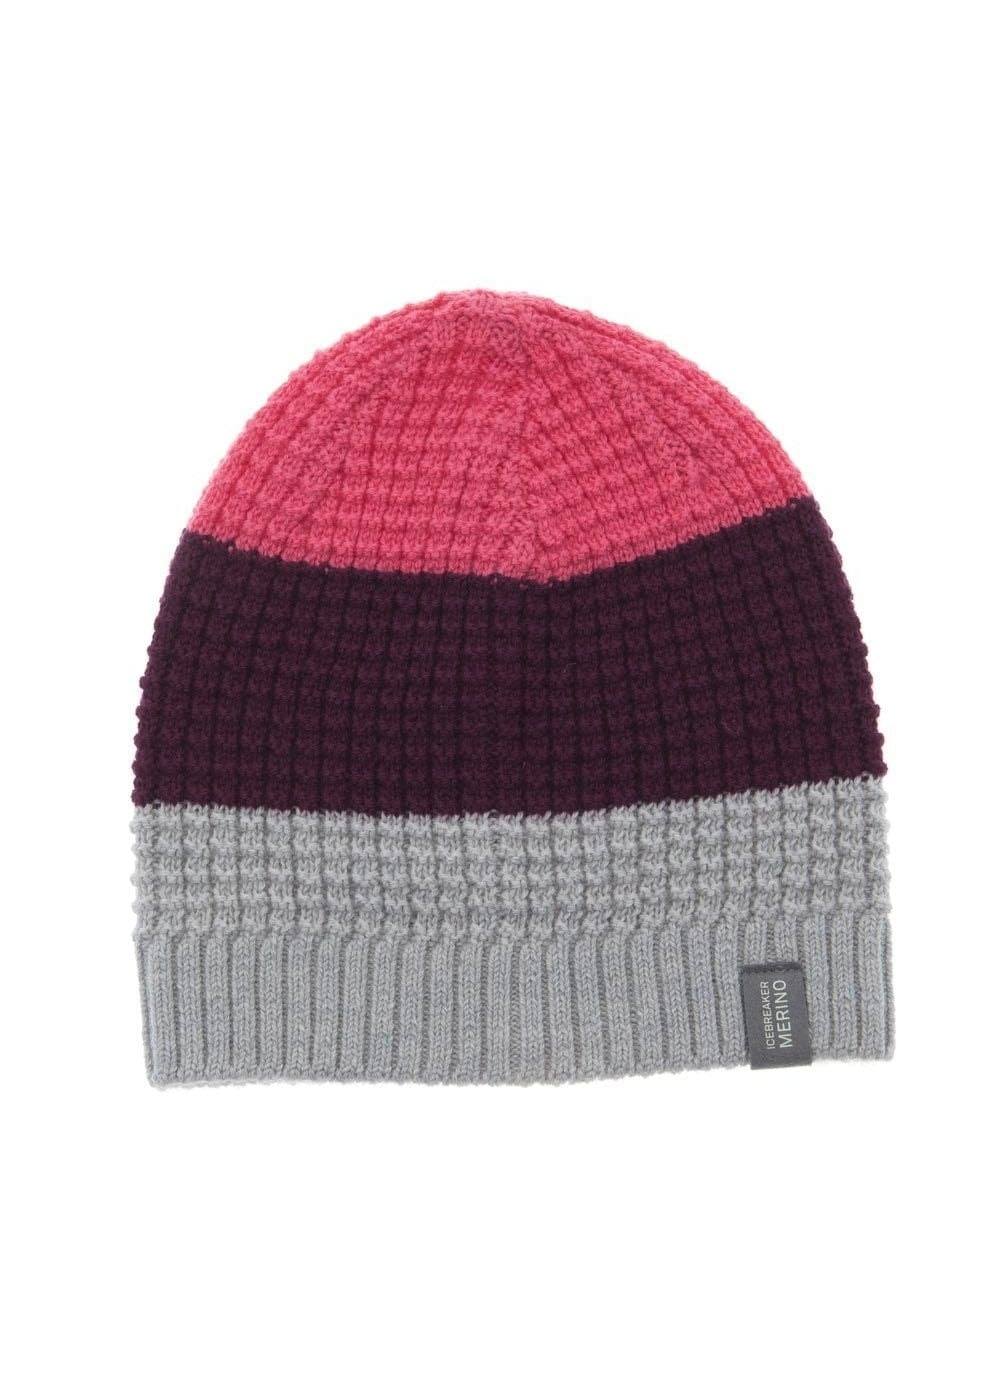 Icebreaker Oasis Beanie Hat- A Hume 5df491d5178